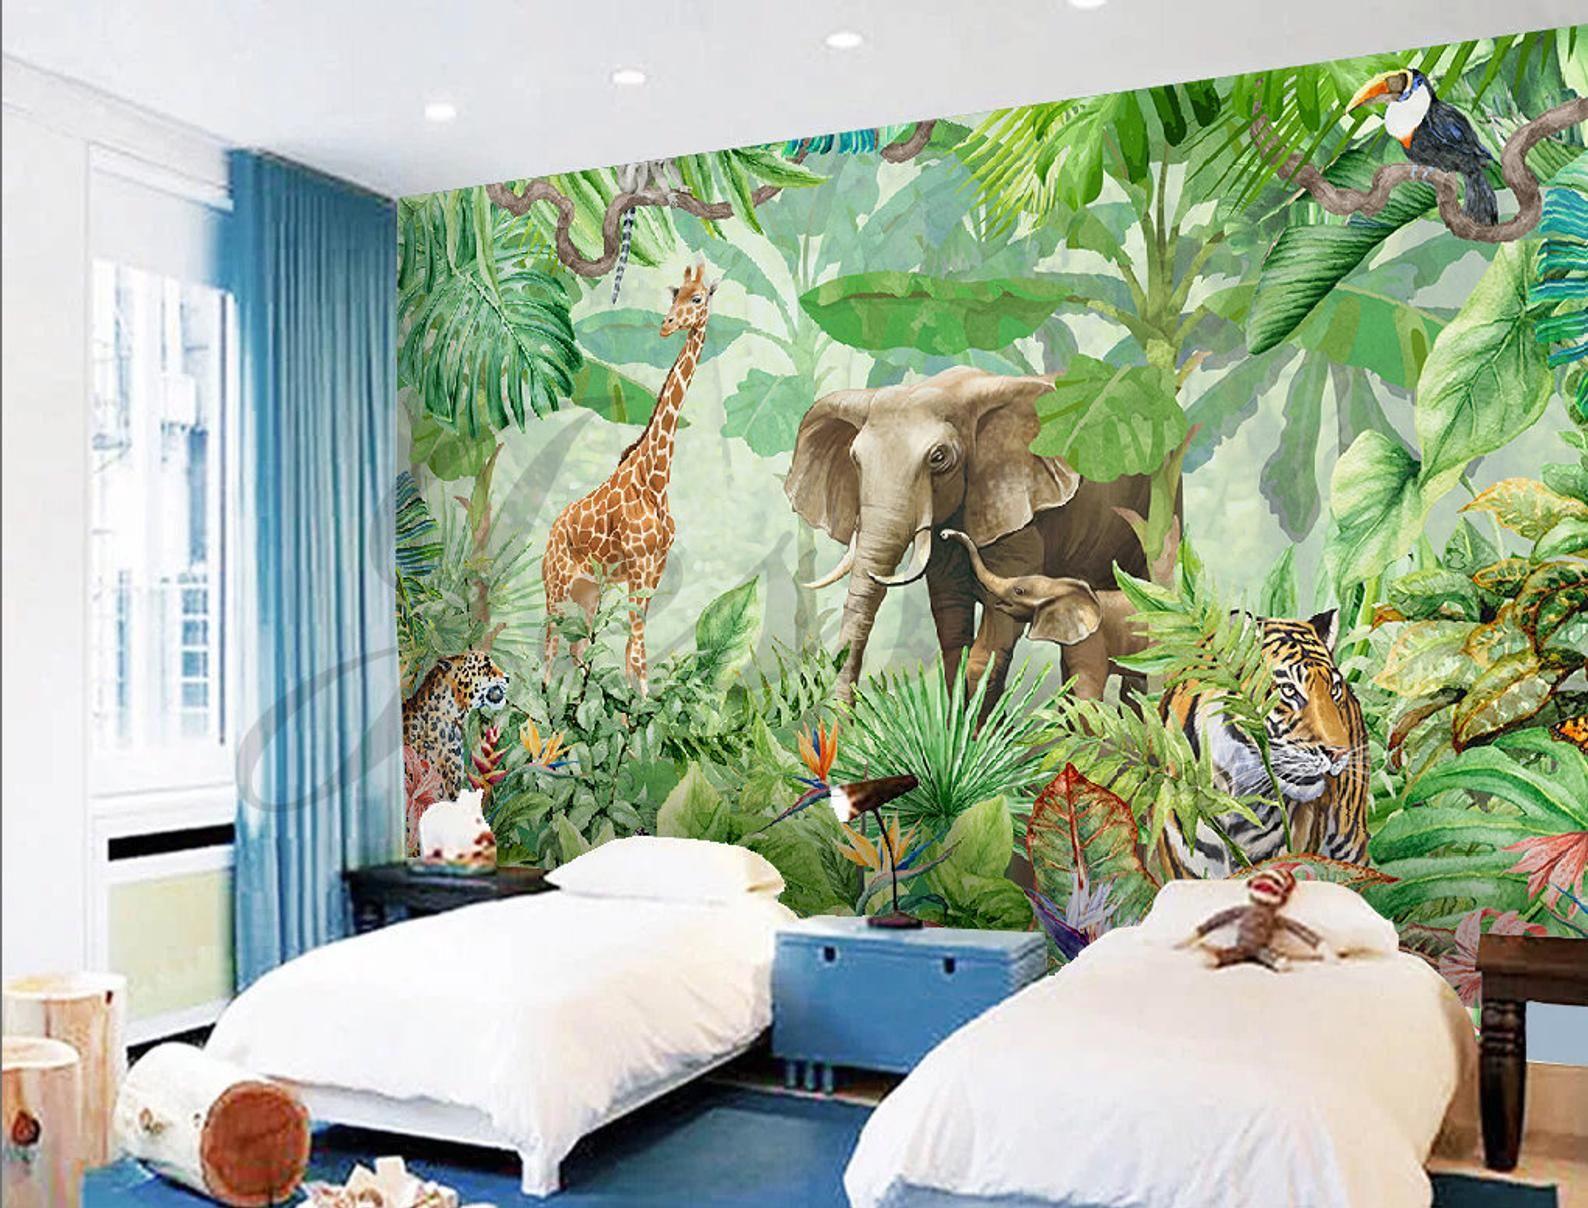 3d Nursery Kids Animals Elephant Giraffe Removable Wallpaper Etsy In 2021 Wall Wallpaper Jungle Mural Kids Wall Decals